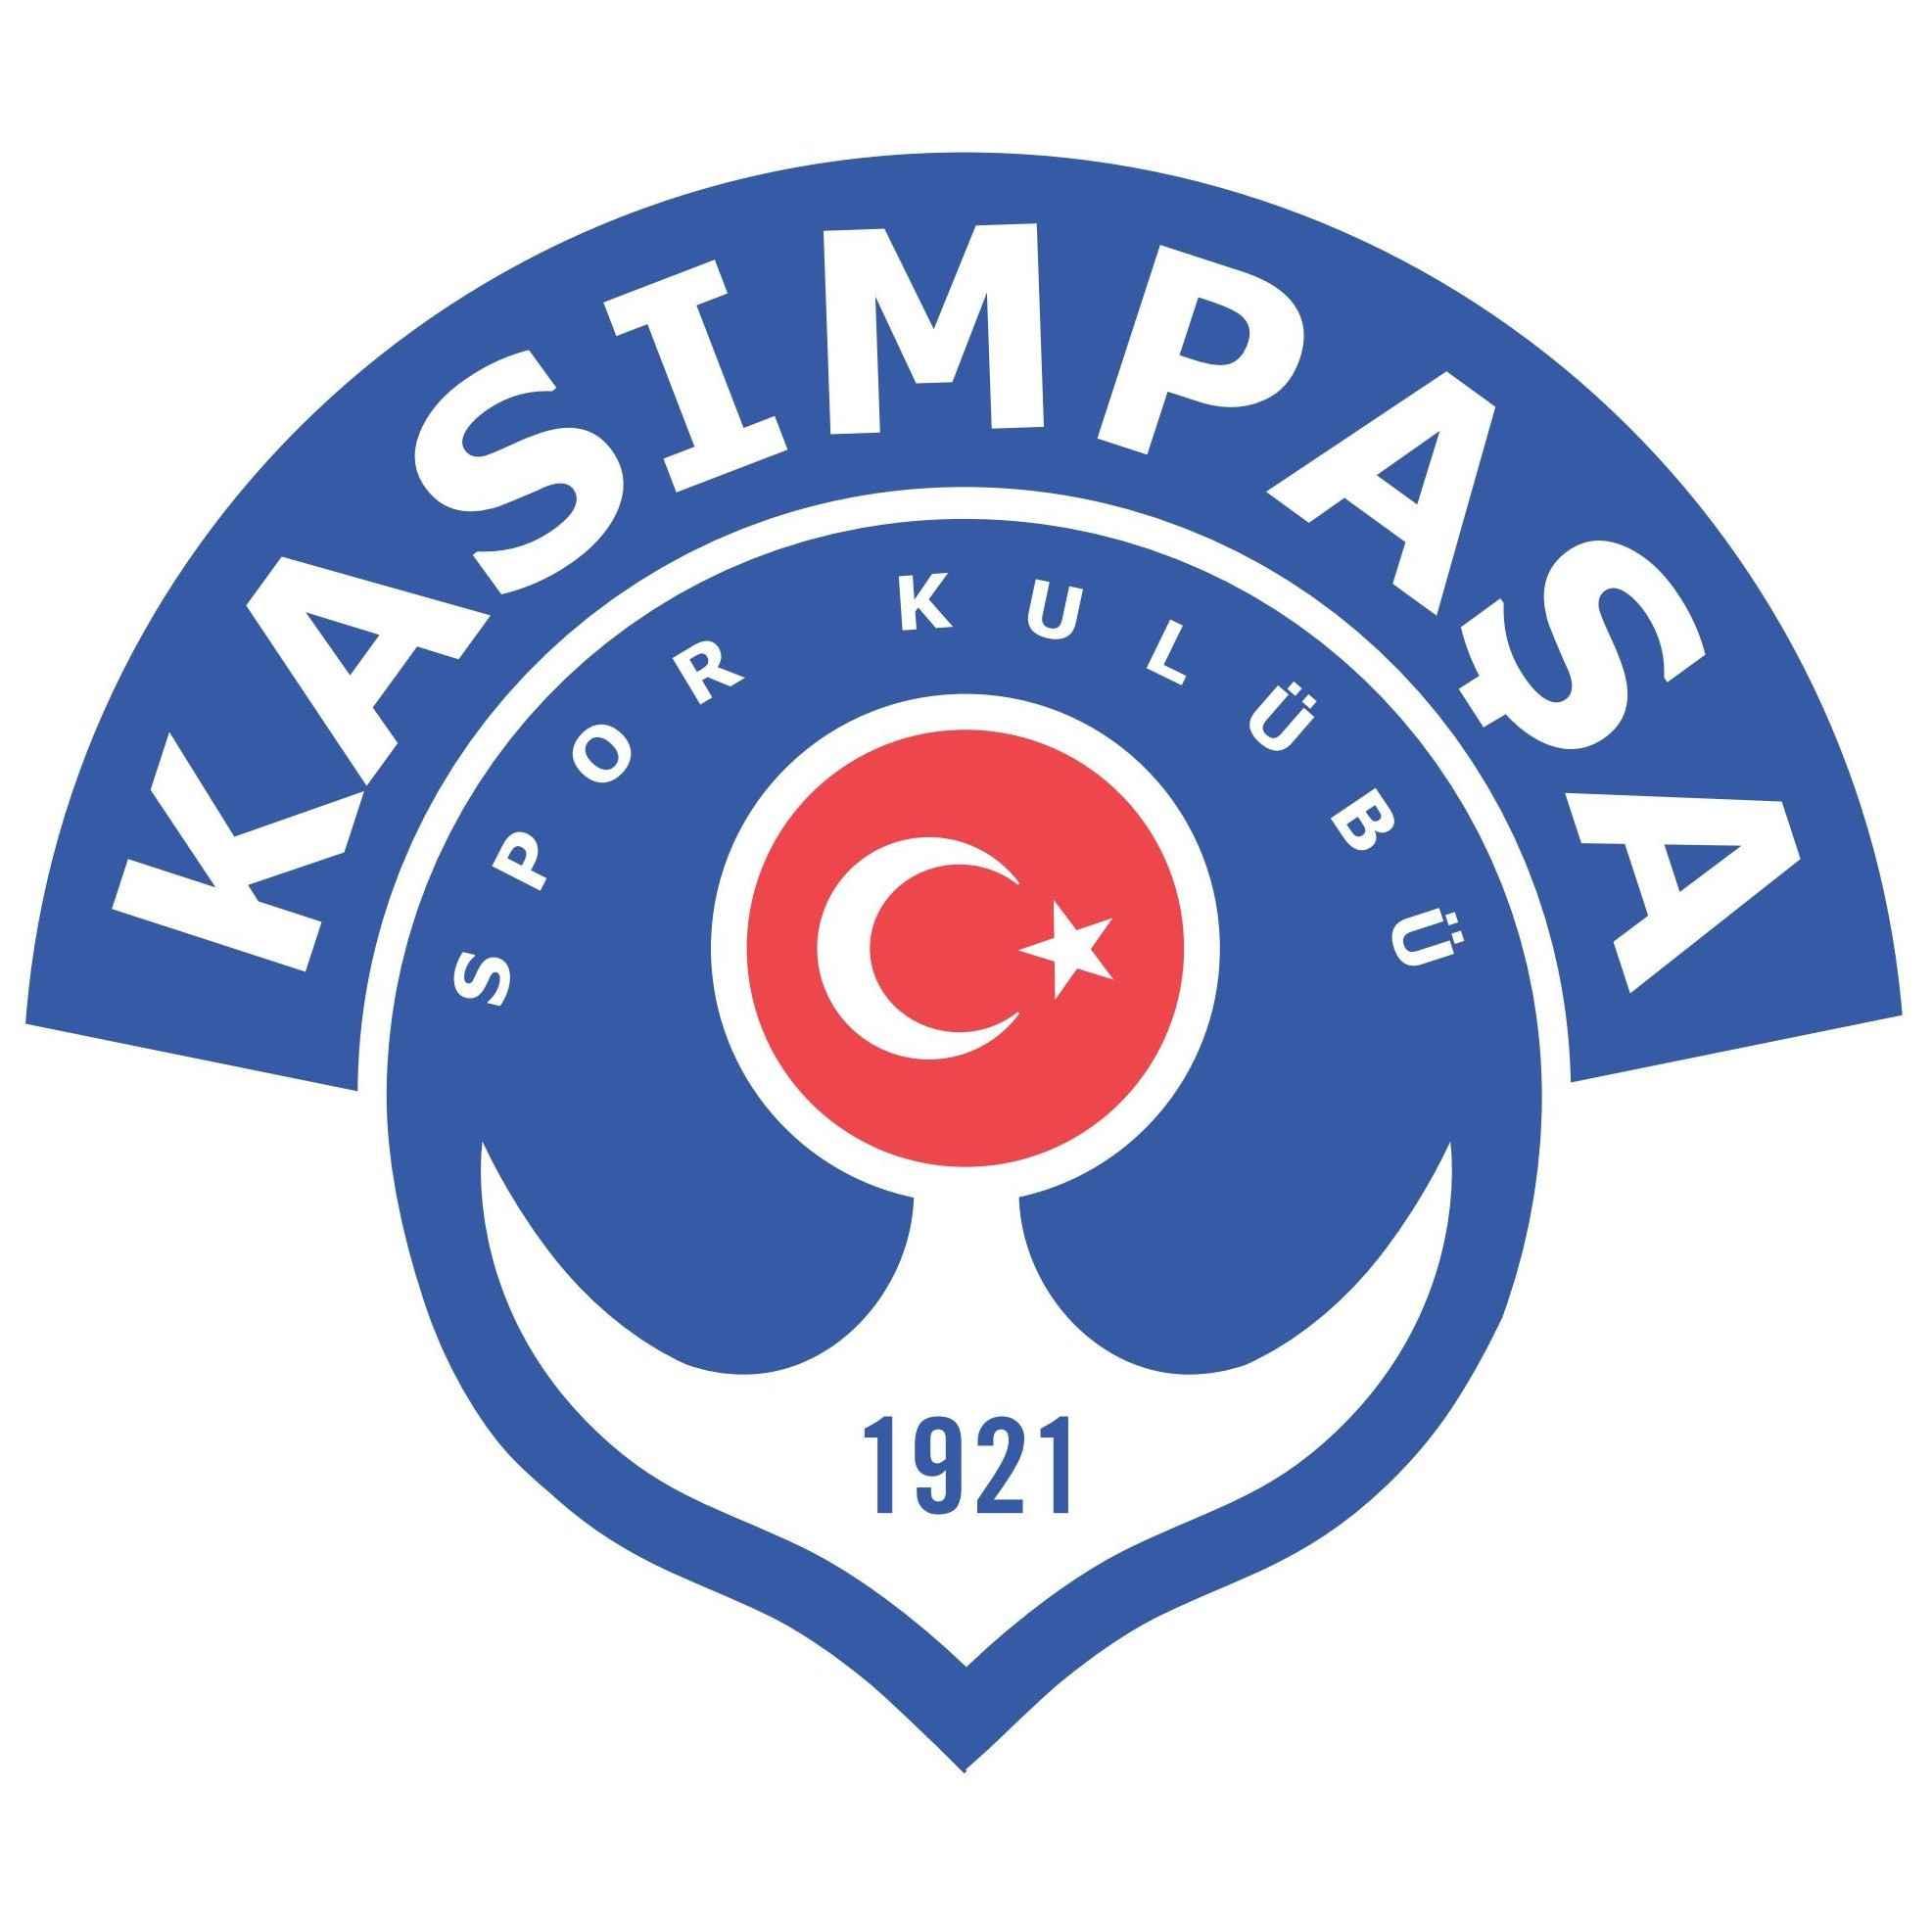 Kasimpasa_Spor_Kulubu_logo